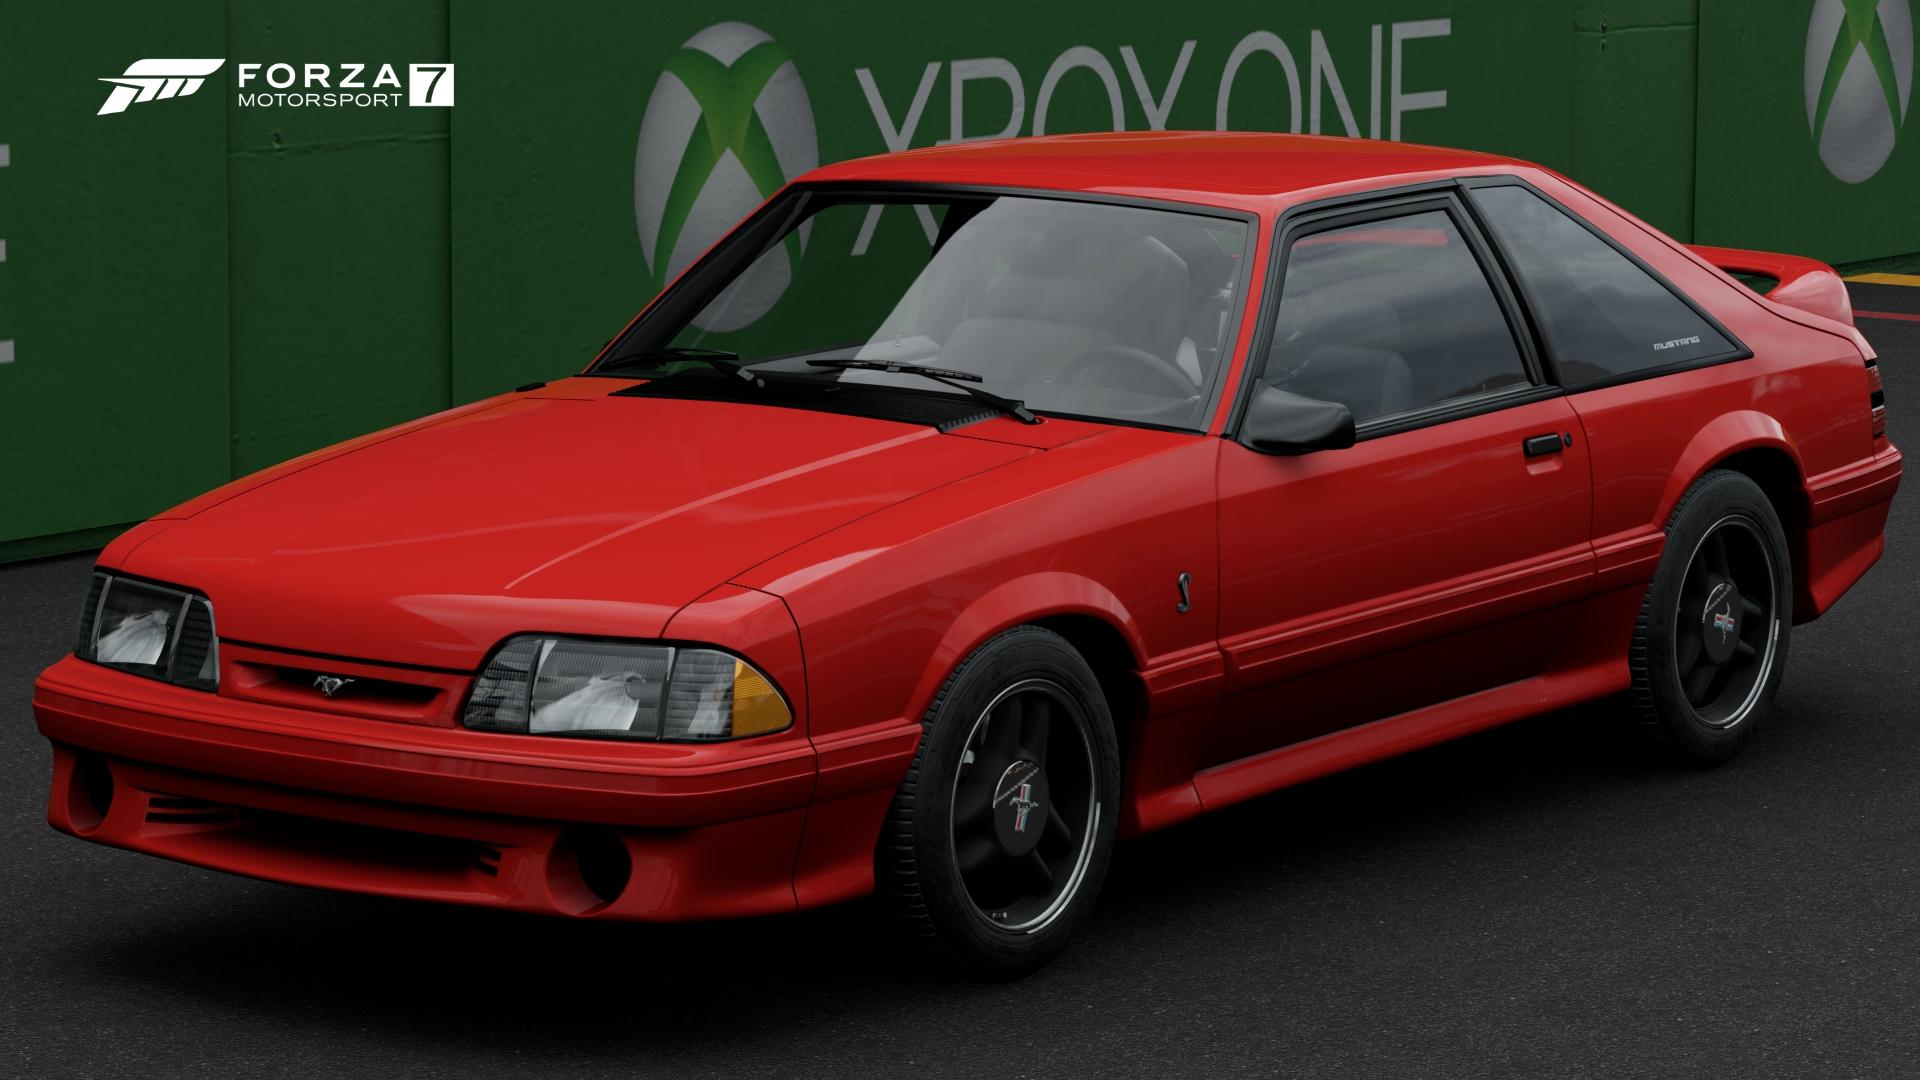 Ford SVT Cobra R (1993) | Forza Motorsport Wiki | FANDOM